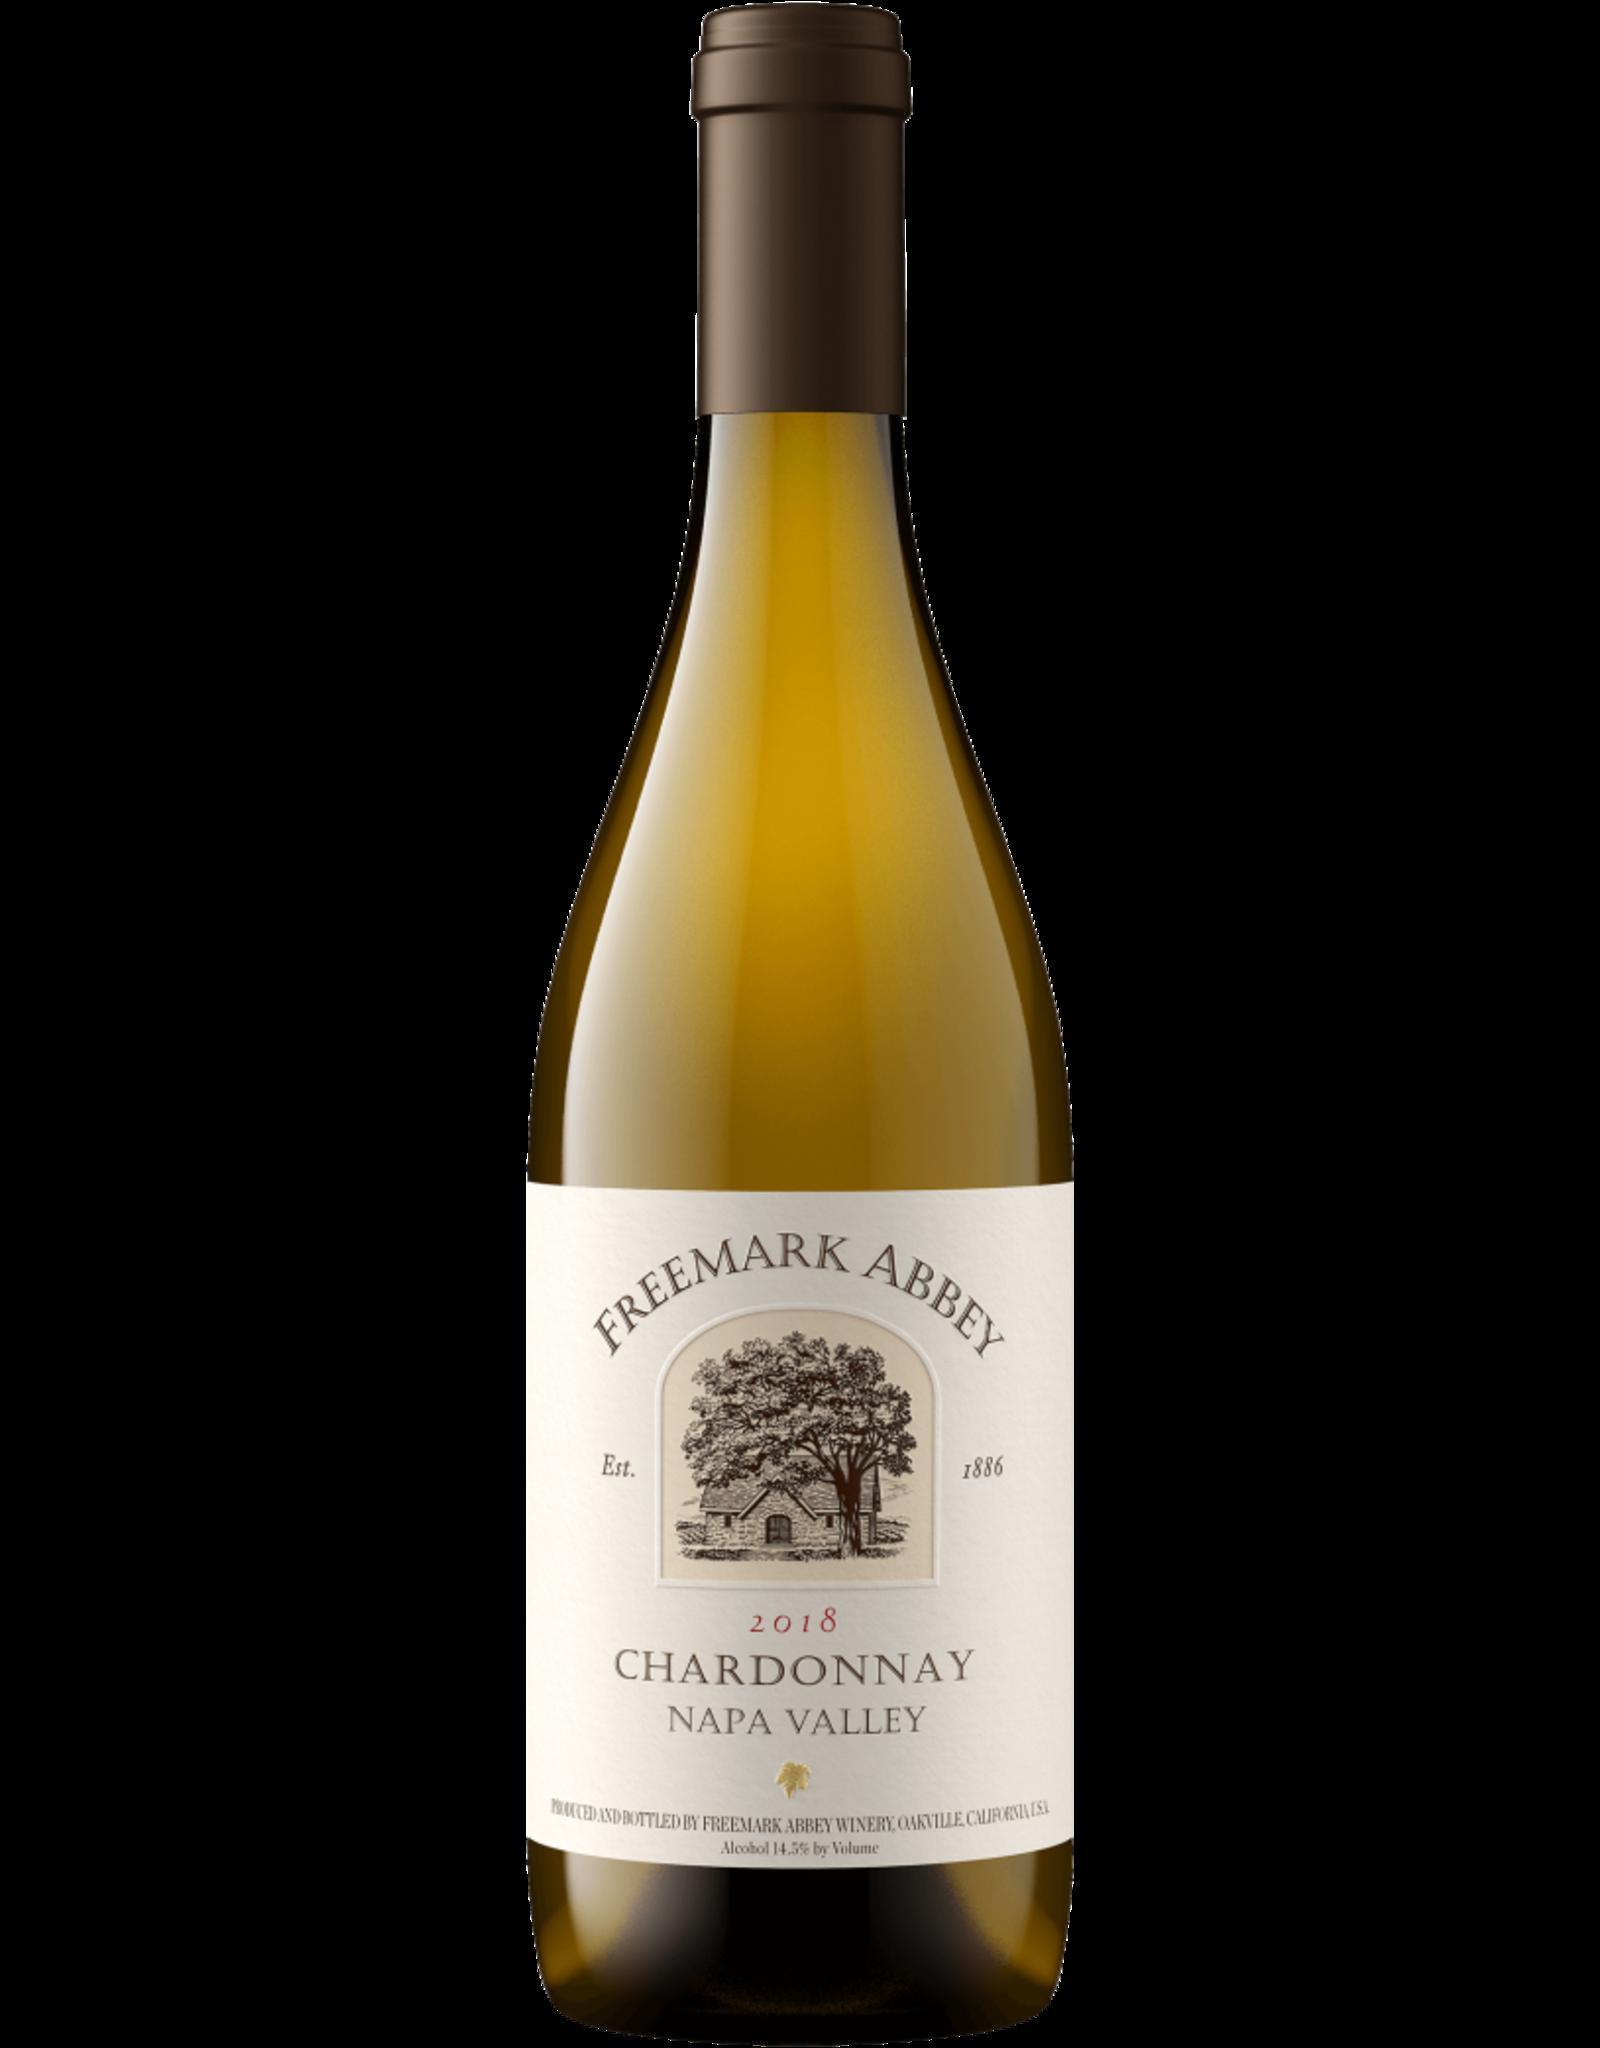 Freemark Abbey Napa Valley Chardonnay